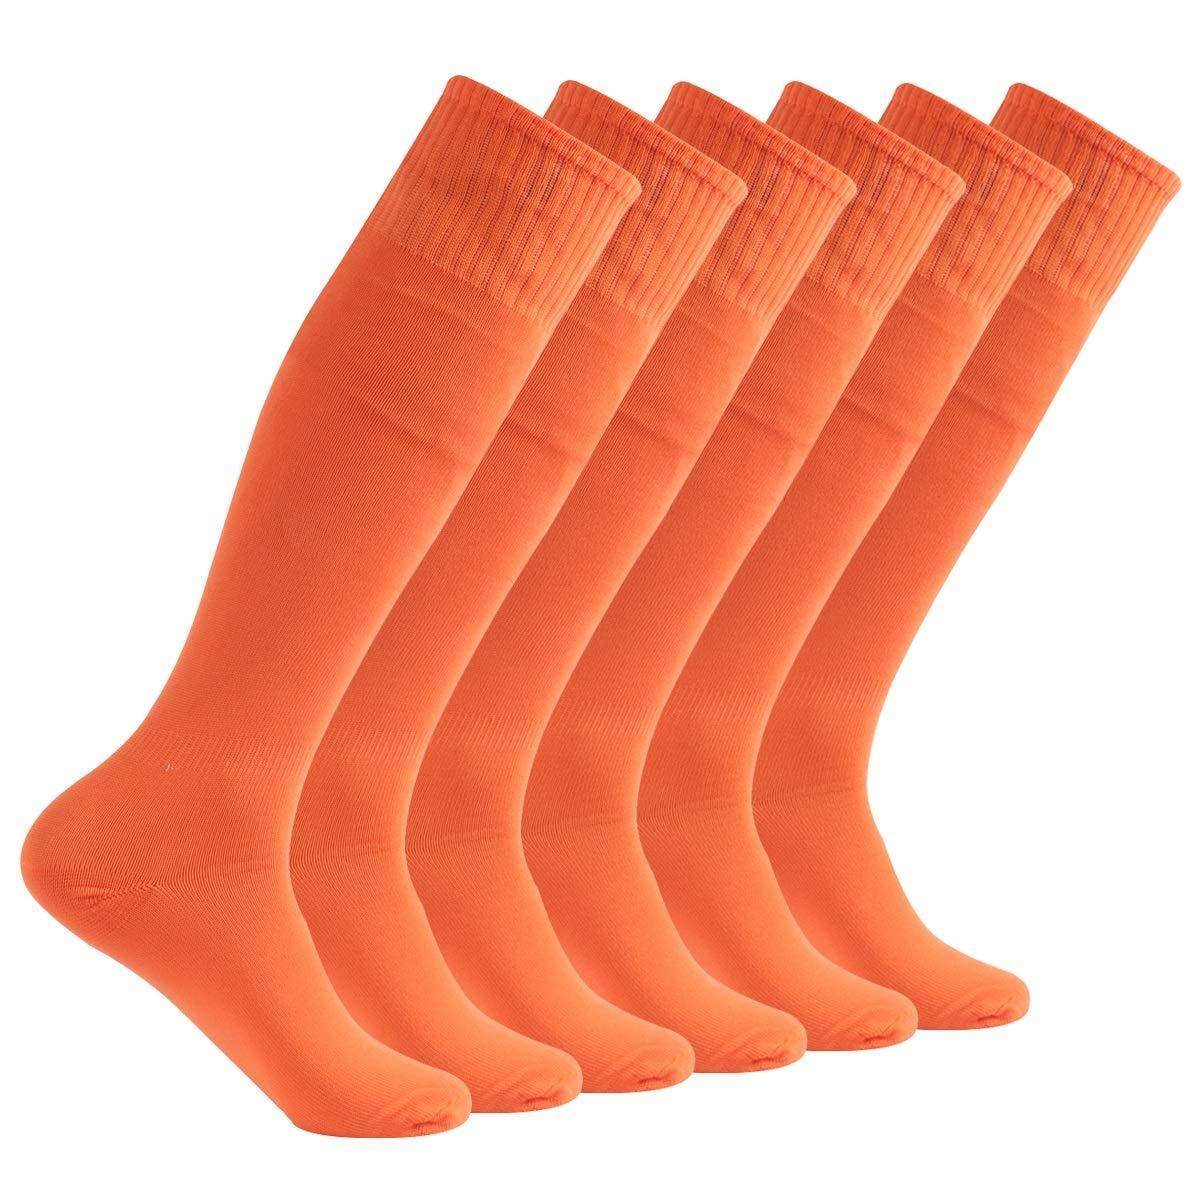 Feelingway Orange Tube Socks, Unsiex Knee High Athletic Soccer socks Sports Meeting Team Socks 6 Pairs Orange by Atrest